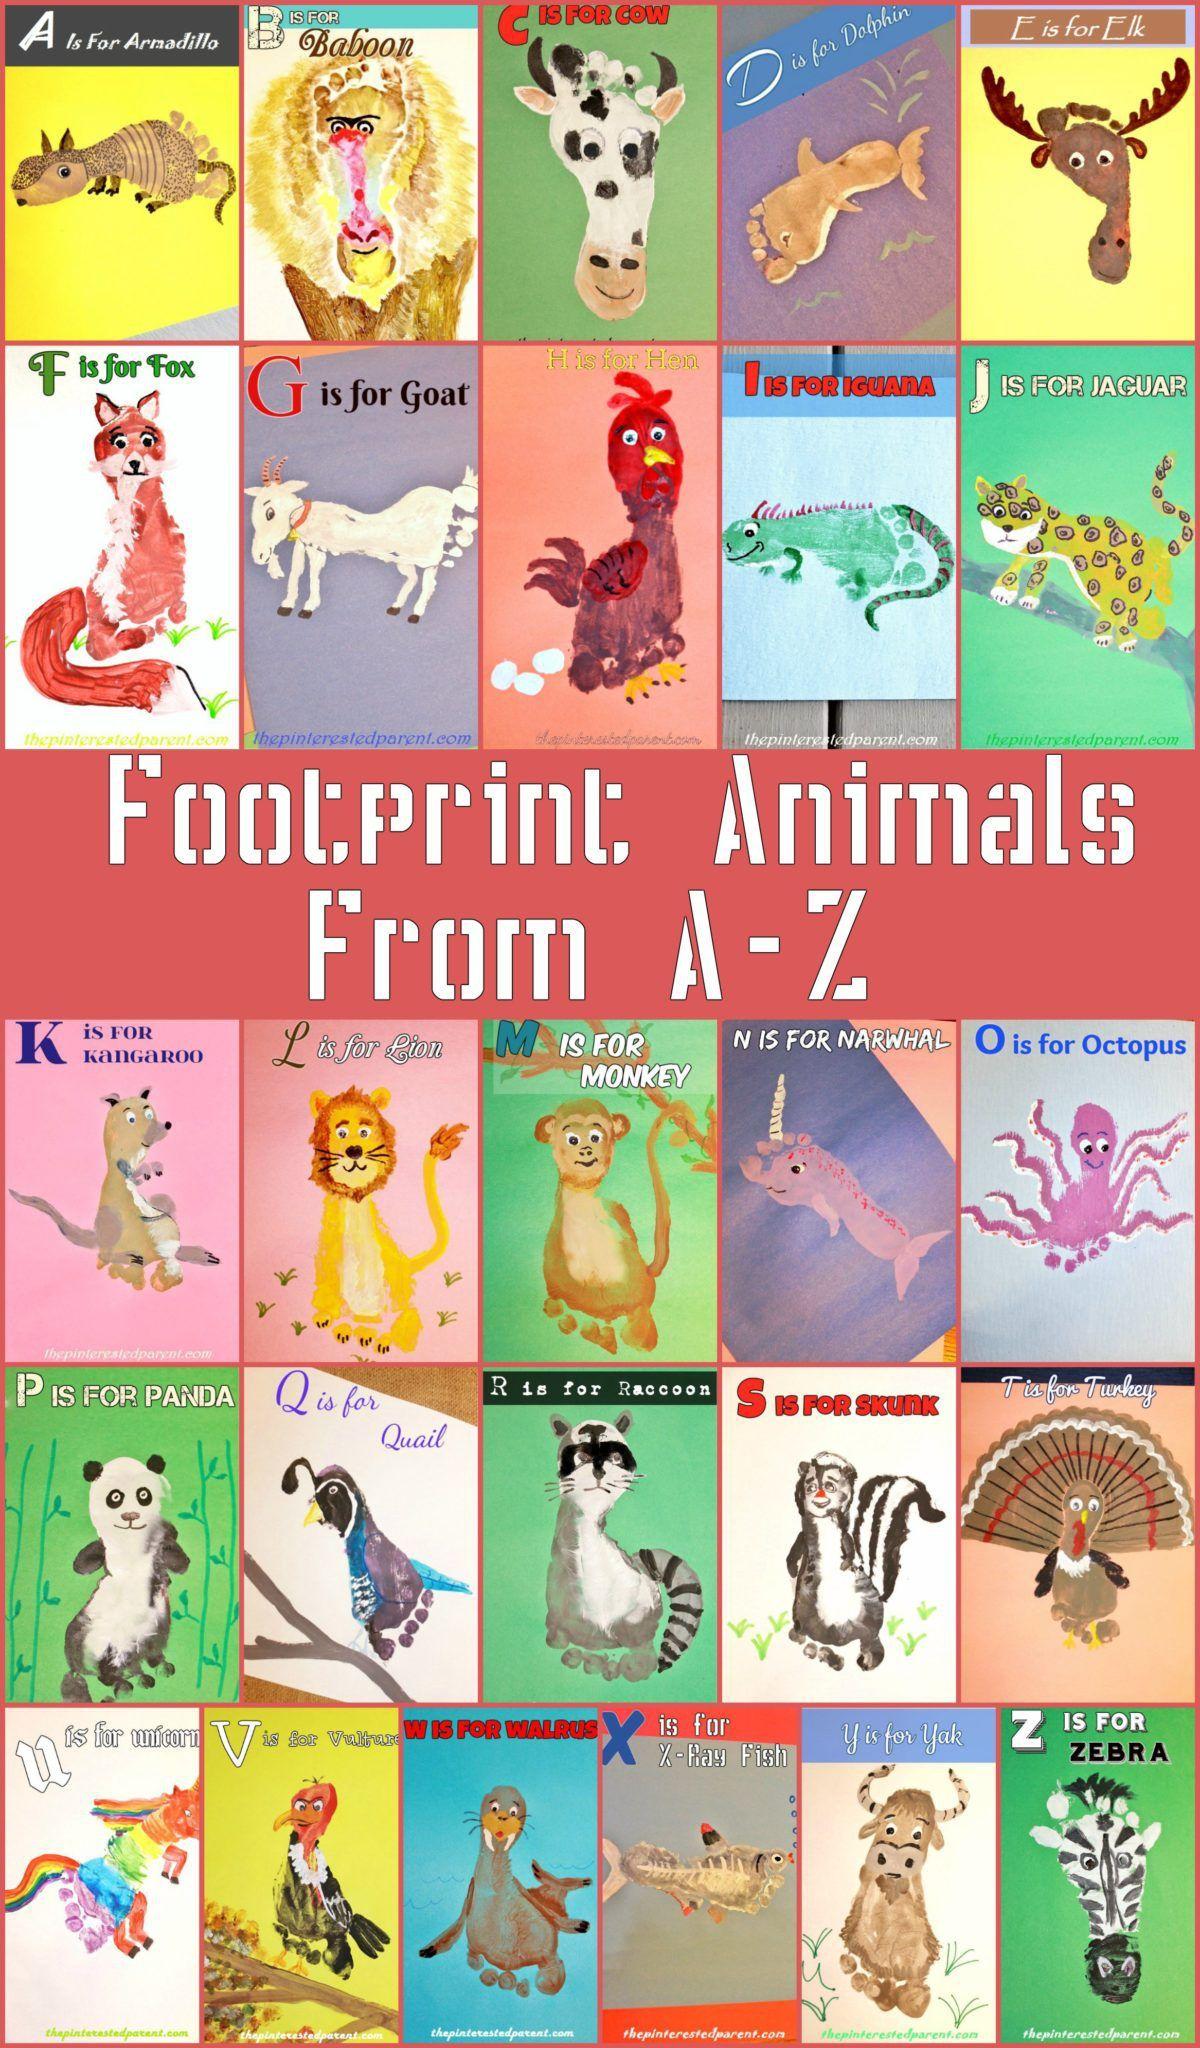 A Z Footprint Animal Crafts Footprint Art Animal Crafts